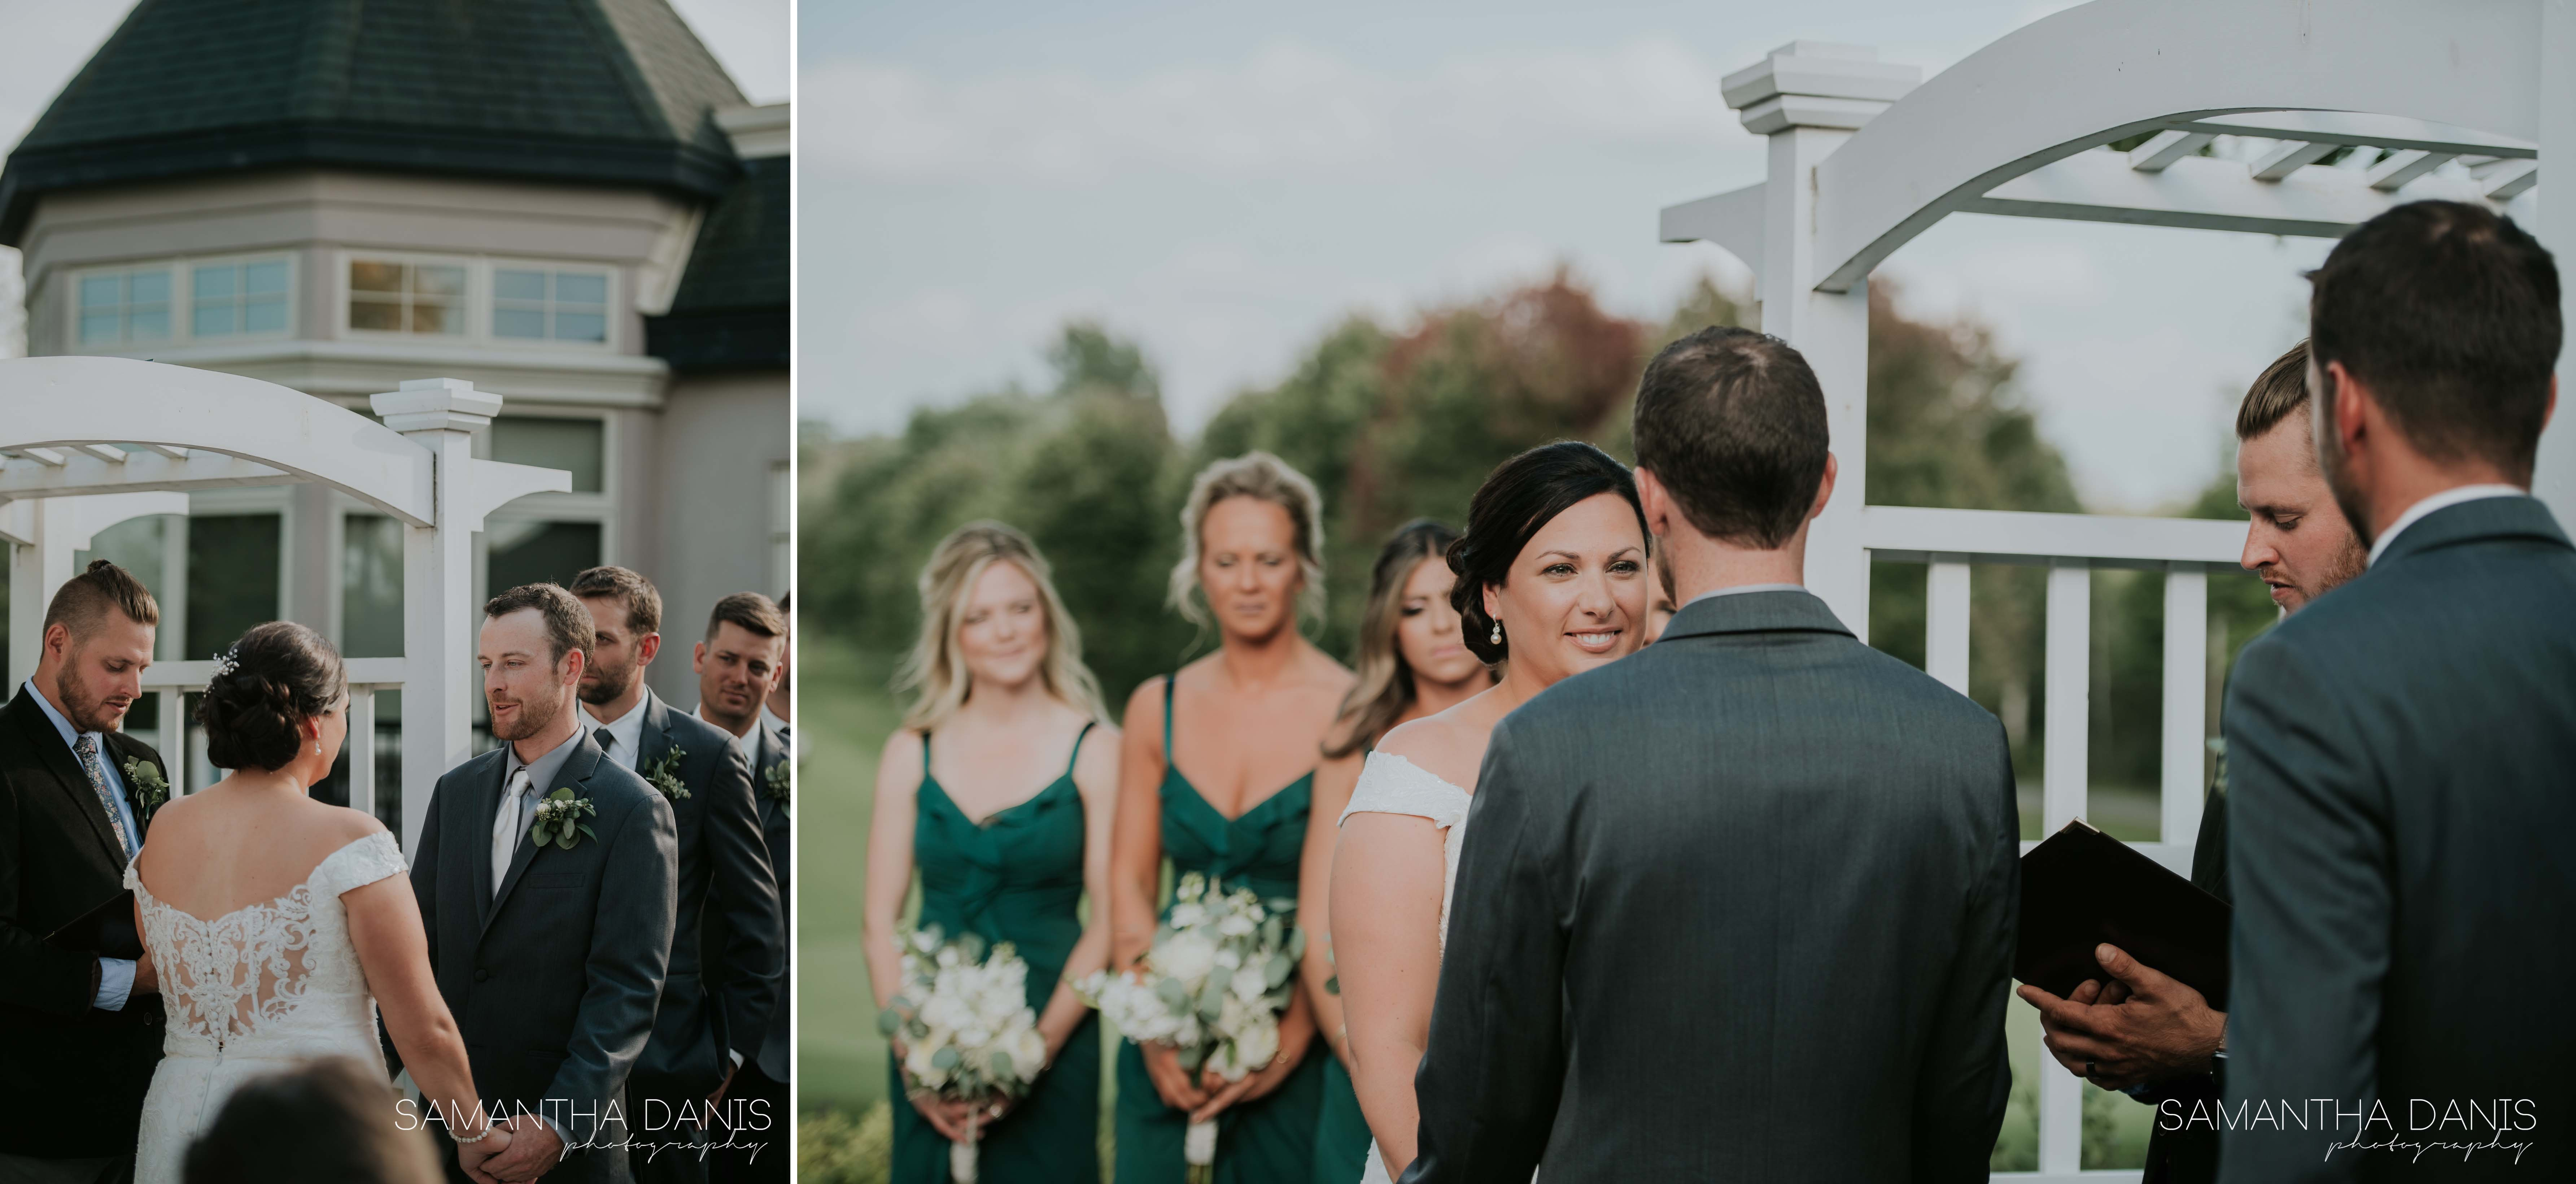 Ottawa wedding Samantha Danis Photography Golf club wedding manotick